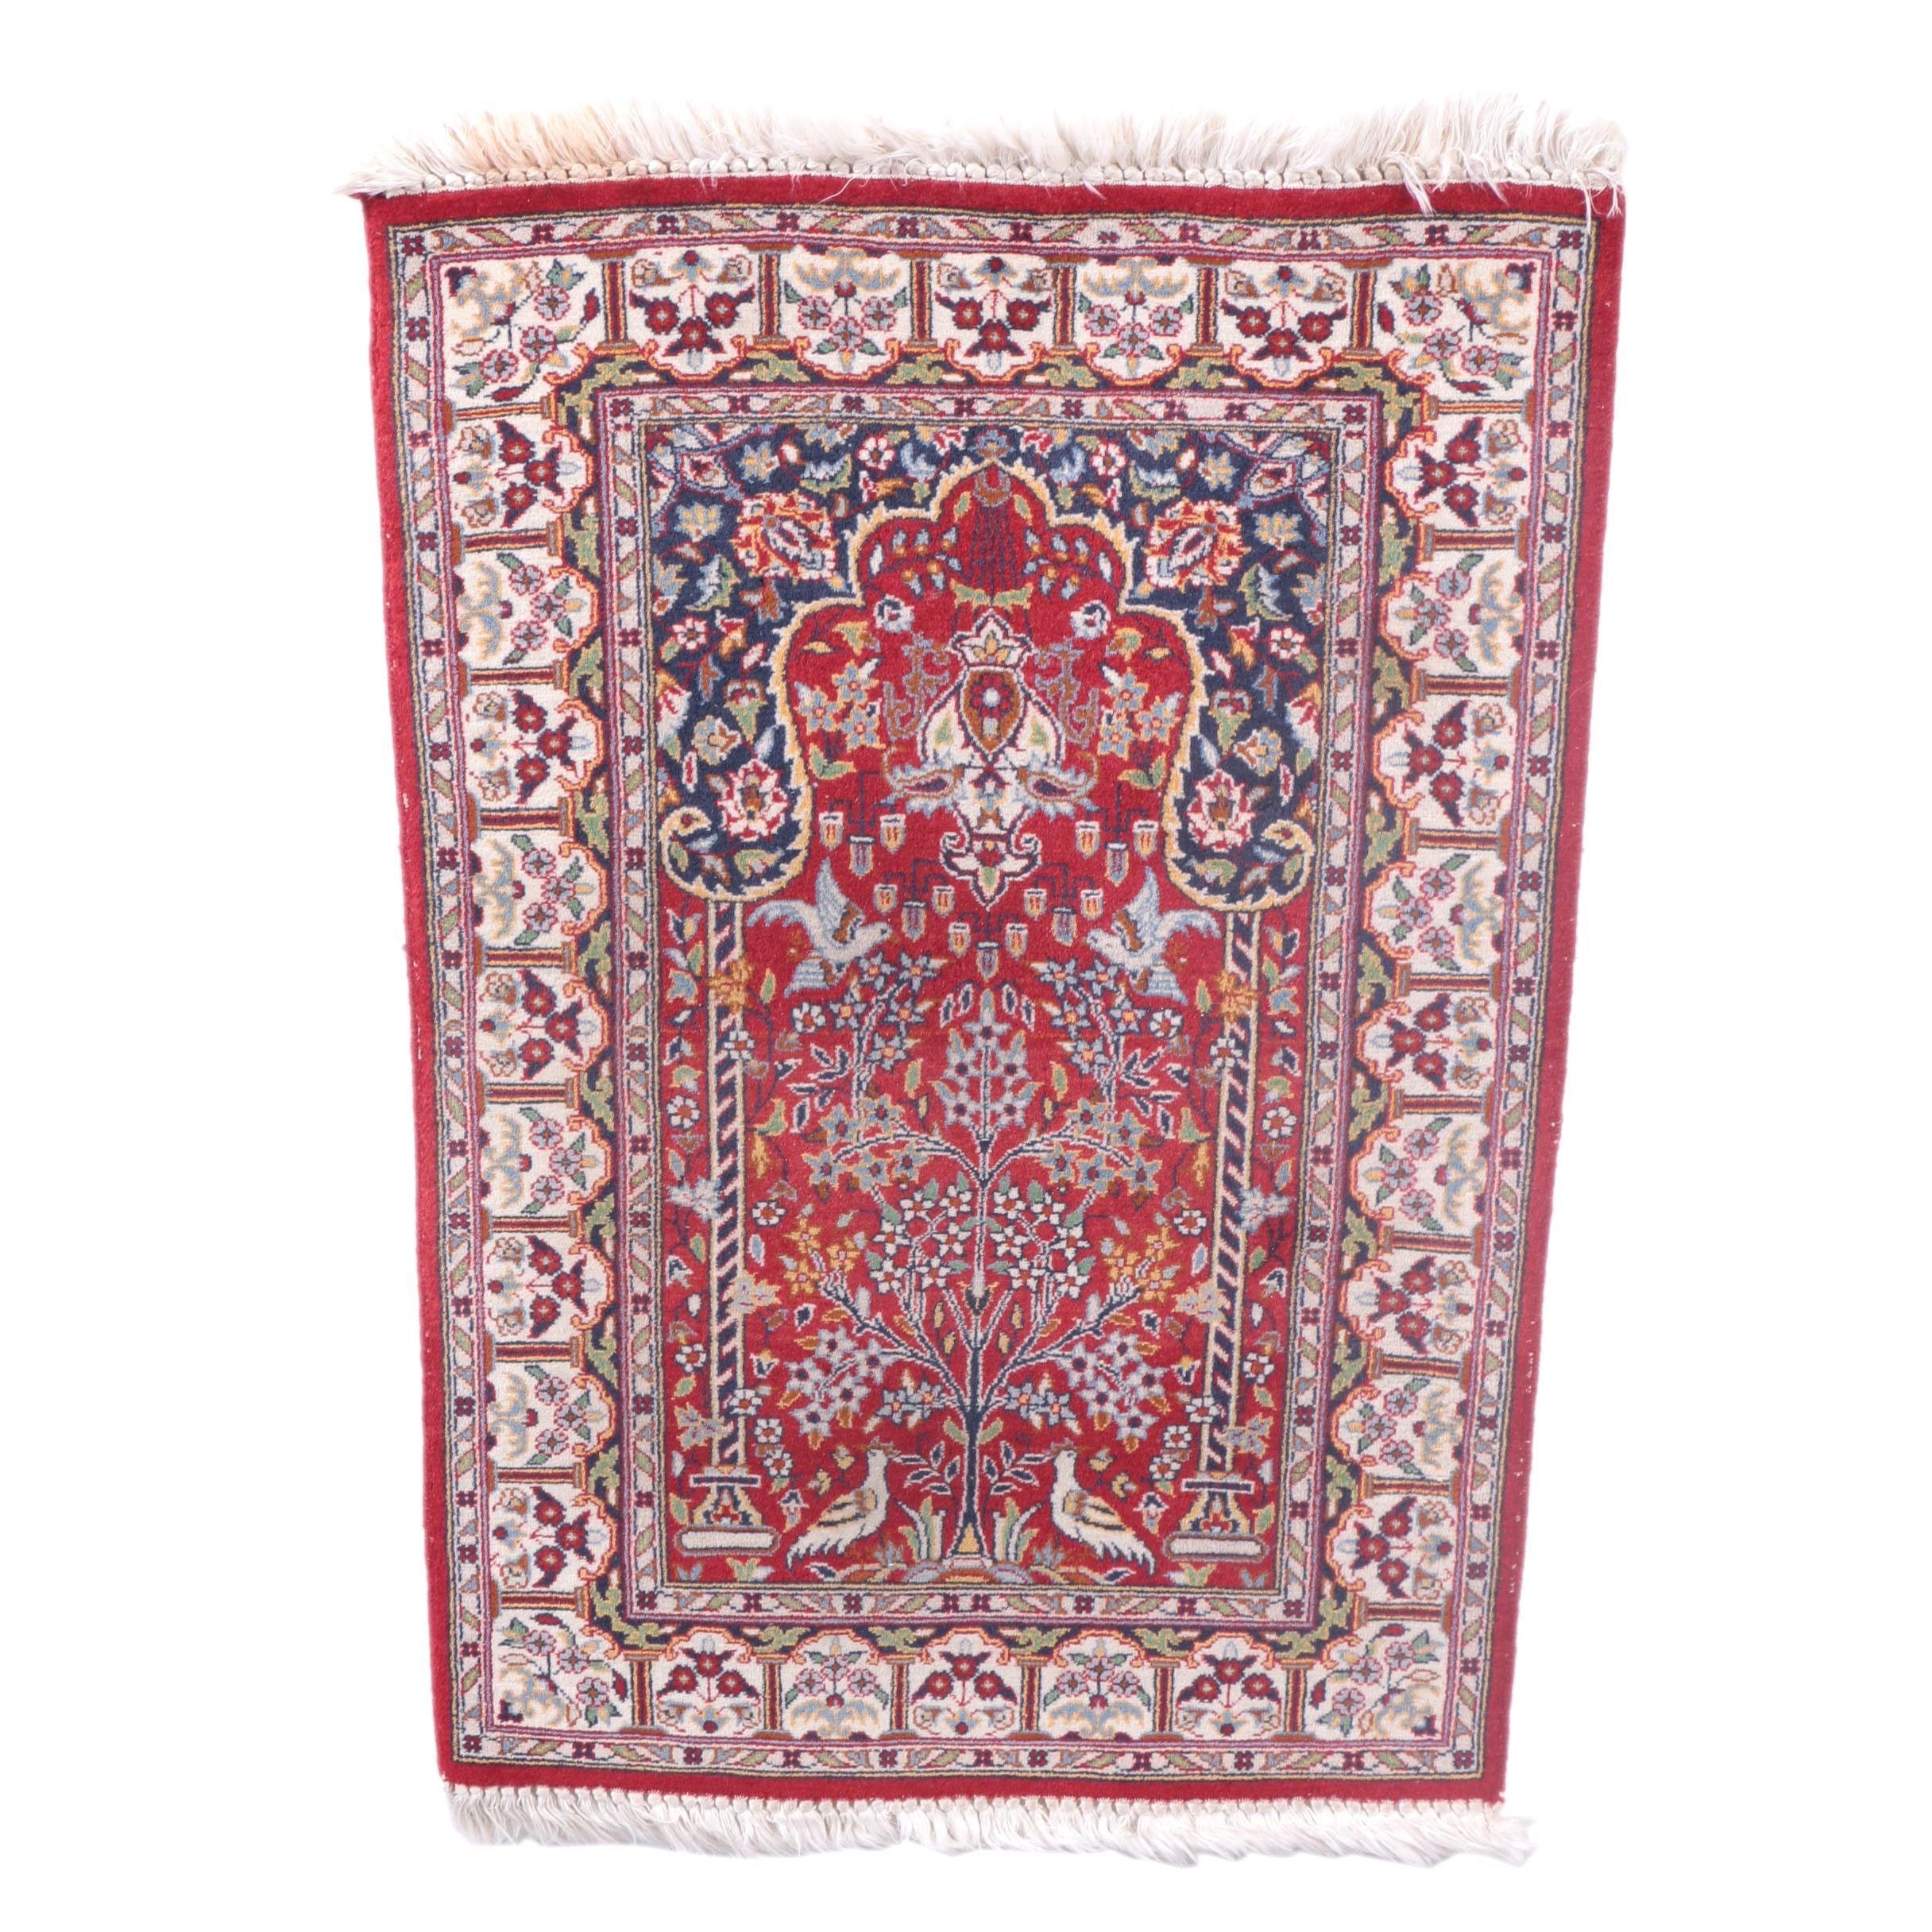 Hand-Knotted Kashan Wool Prayer Rug